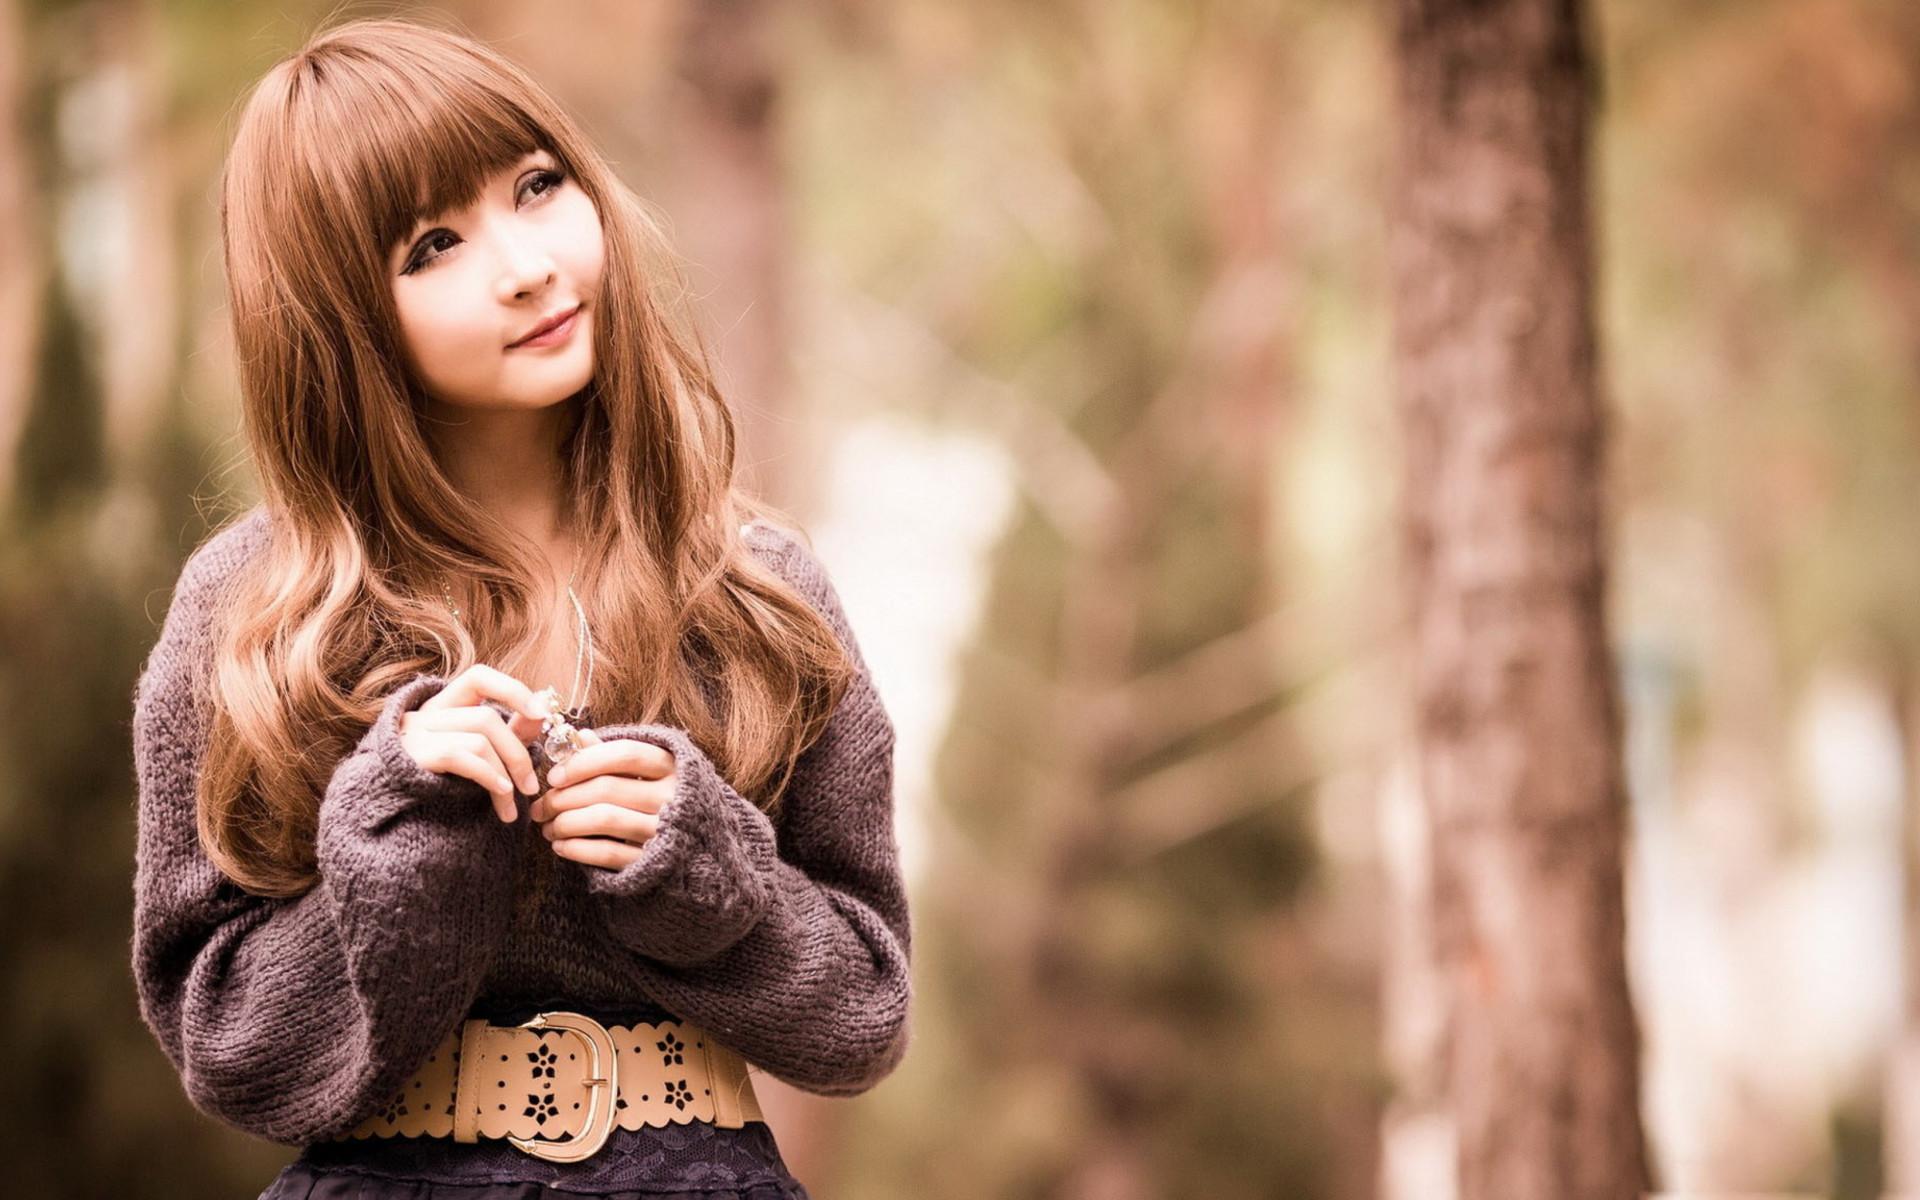 Asian Girls Wallpapers HD